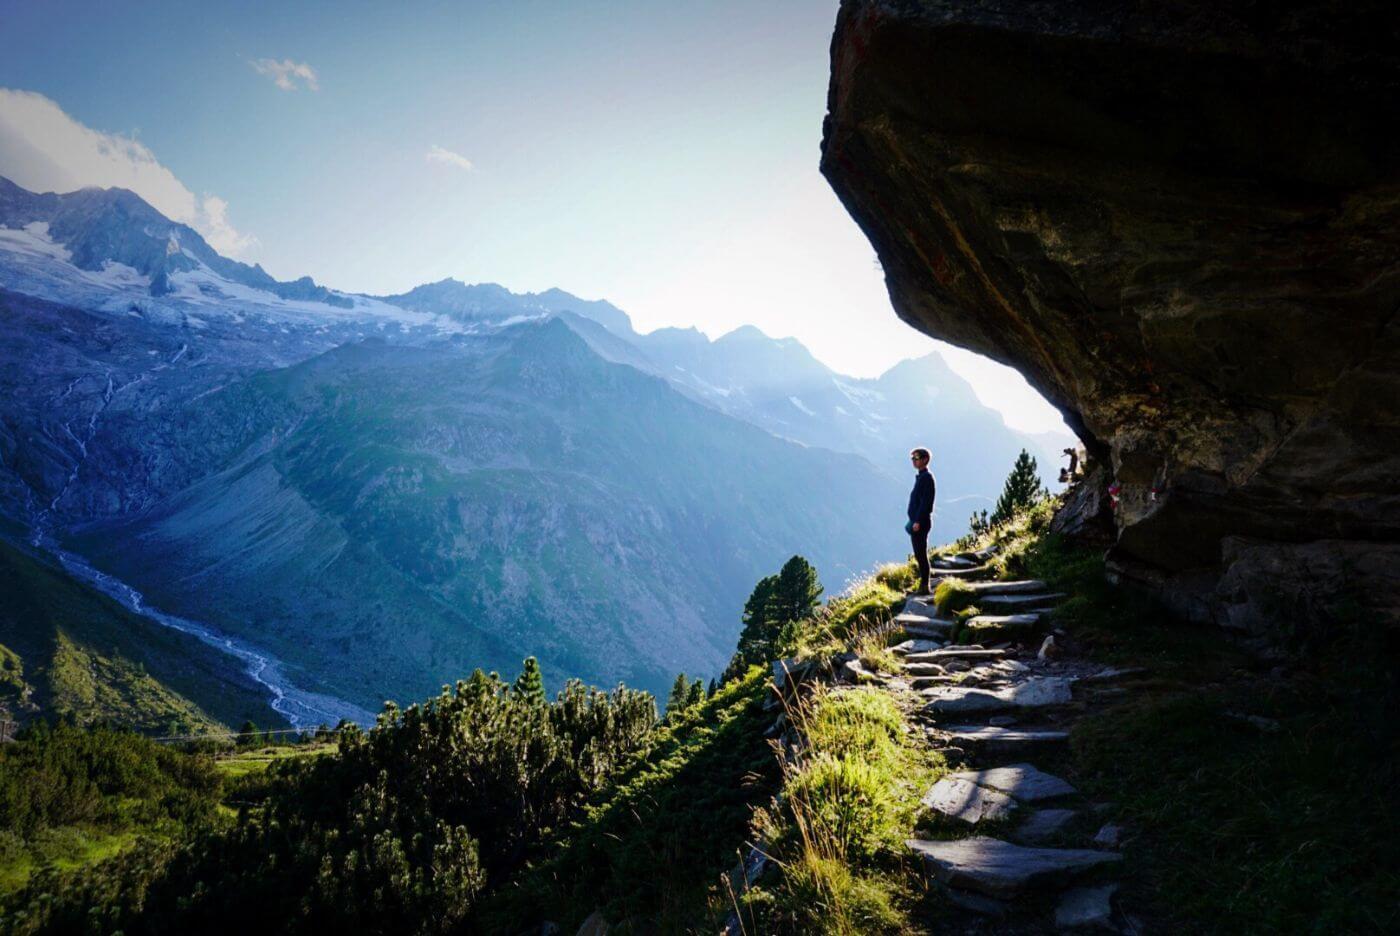 Berliner Höhenweg, Zillertal Alps, Austria - Trekking guide